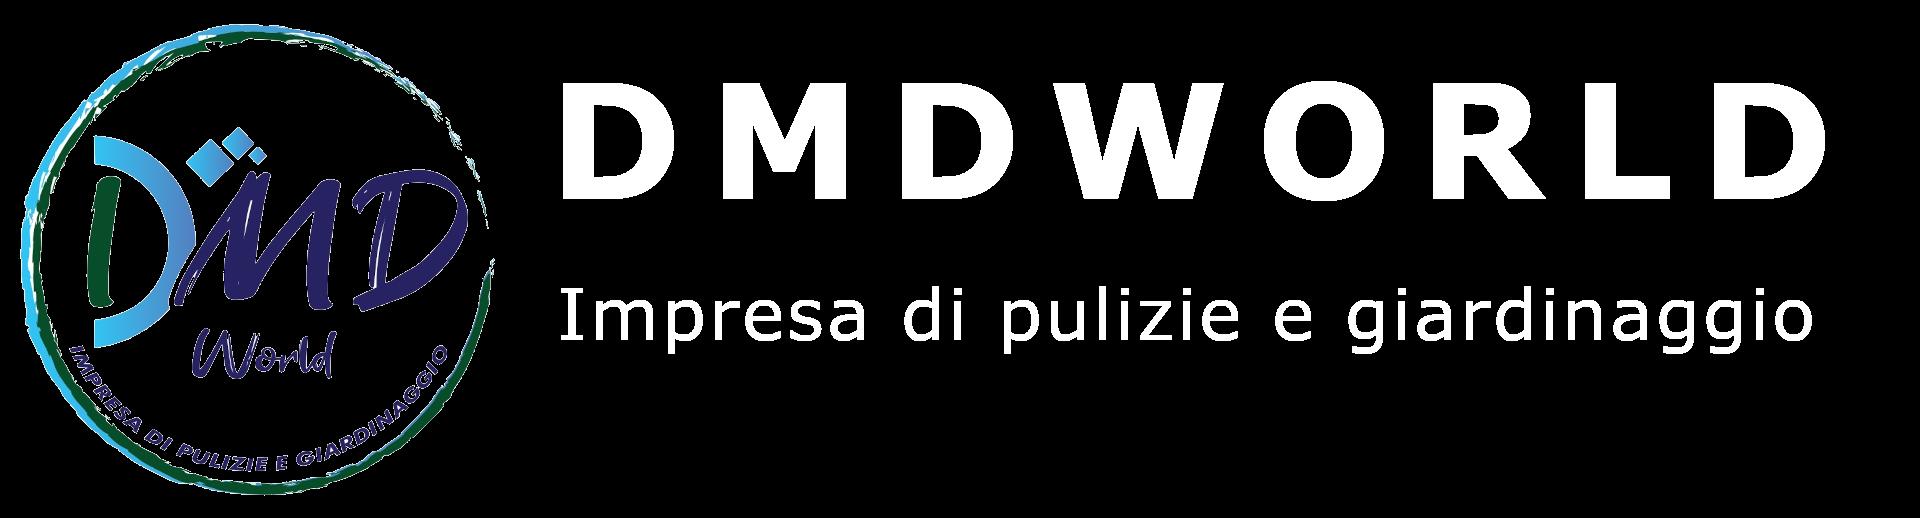 DMDWORLD